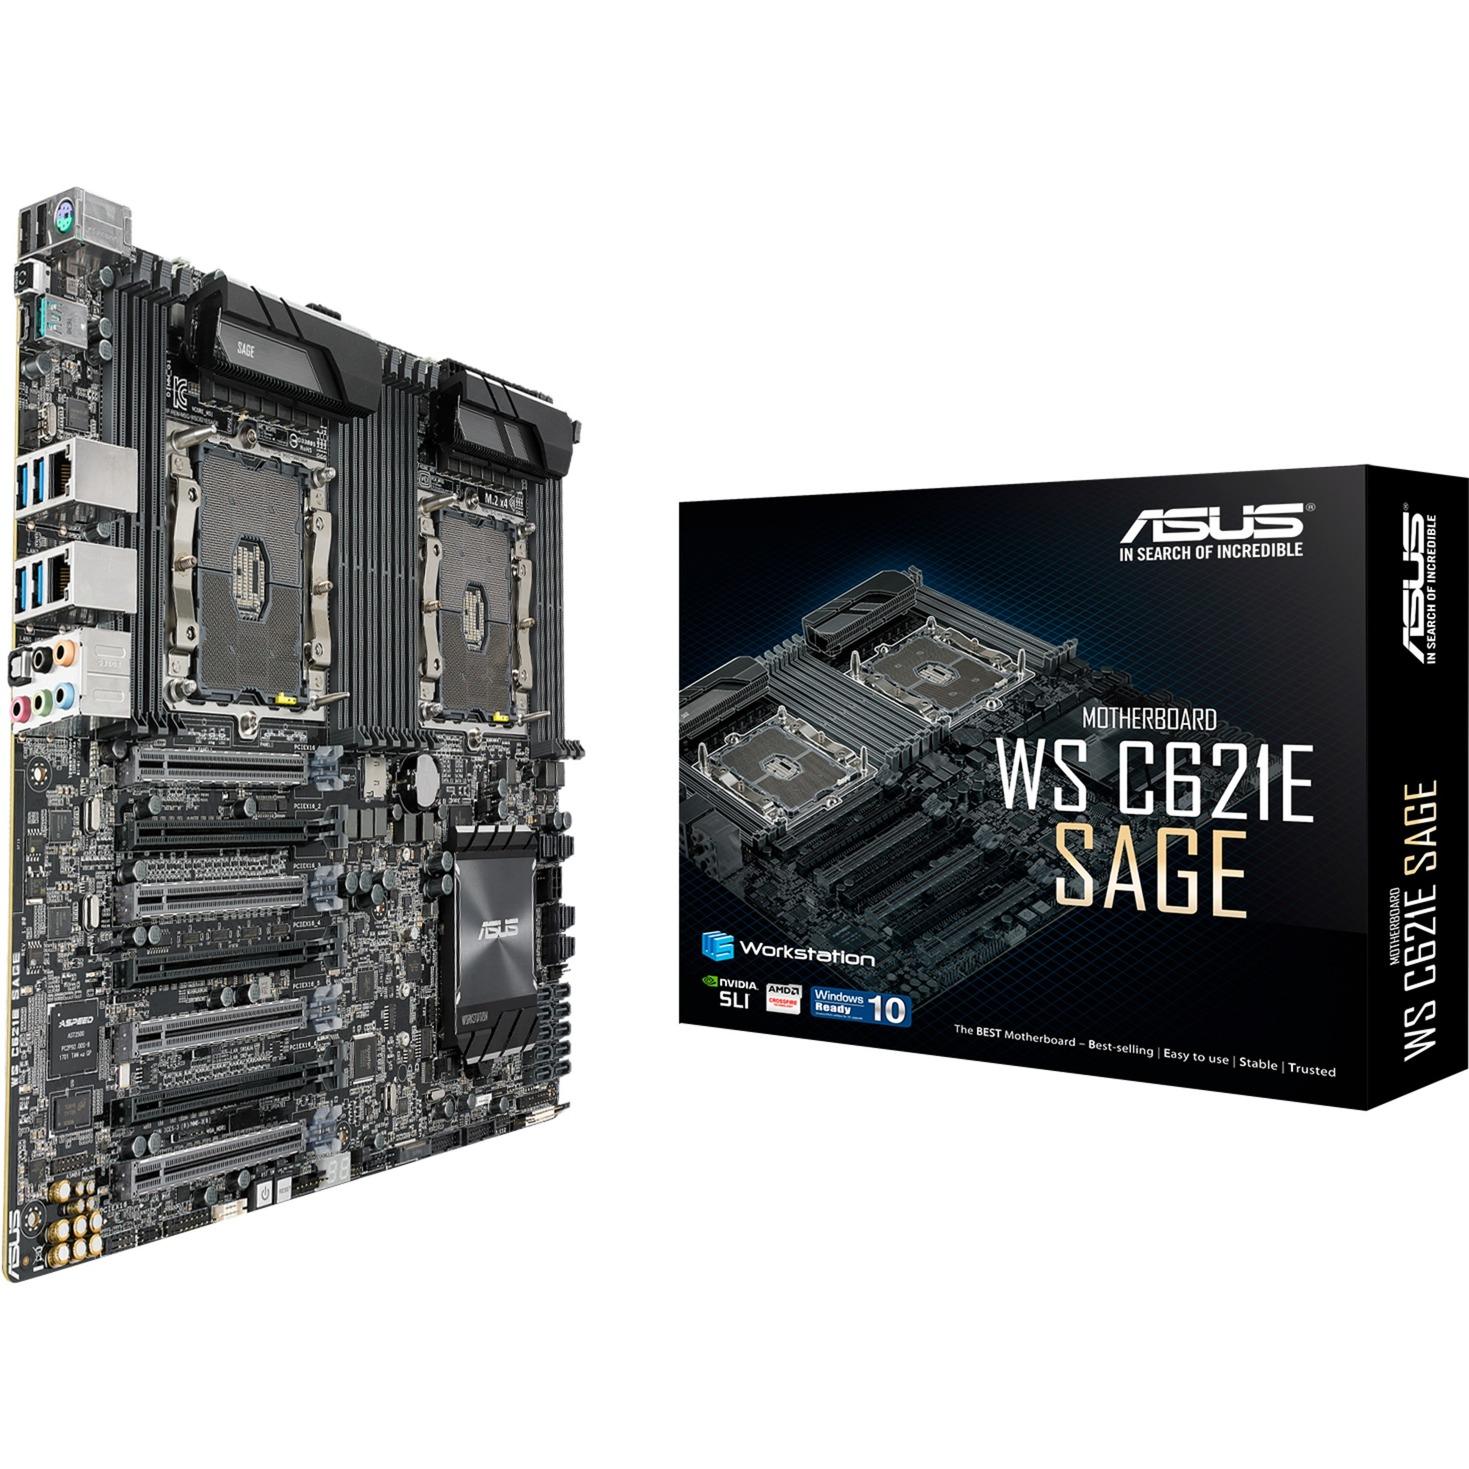 WS C621E SAGE Intel C621 Prise P EEB carte mère